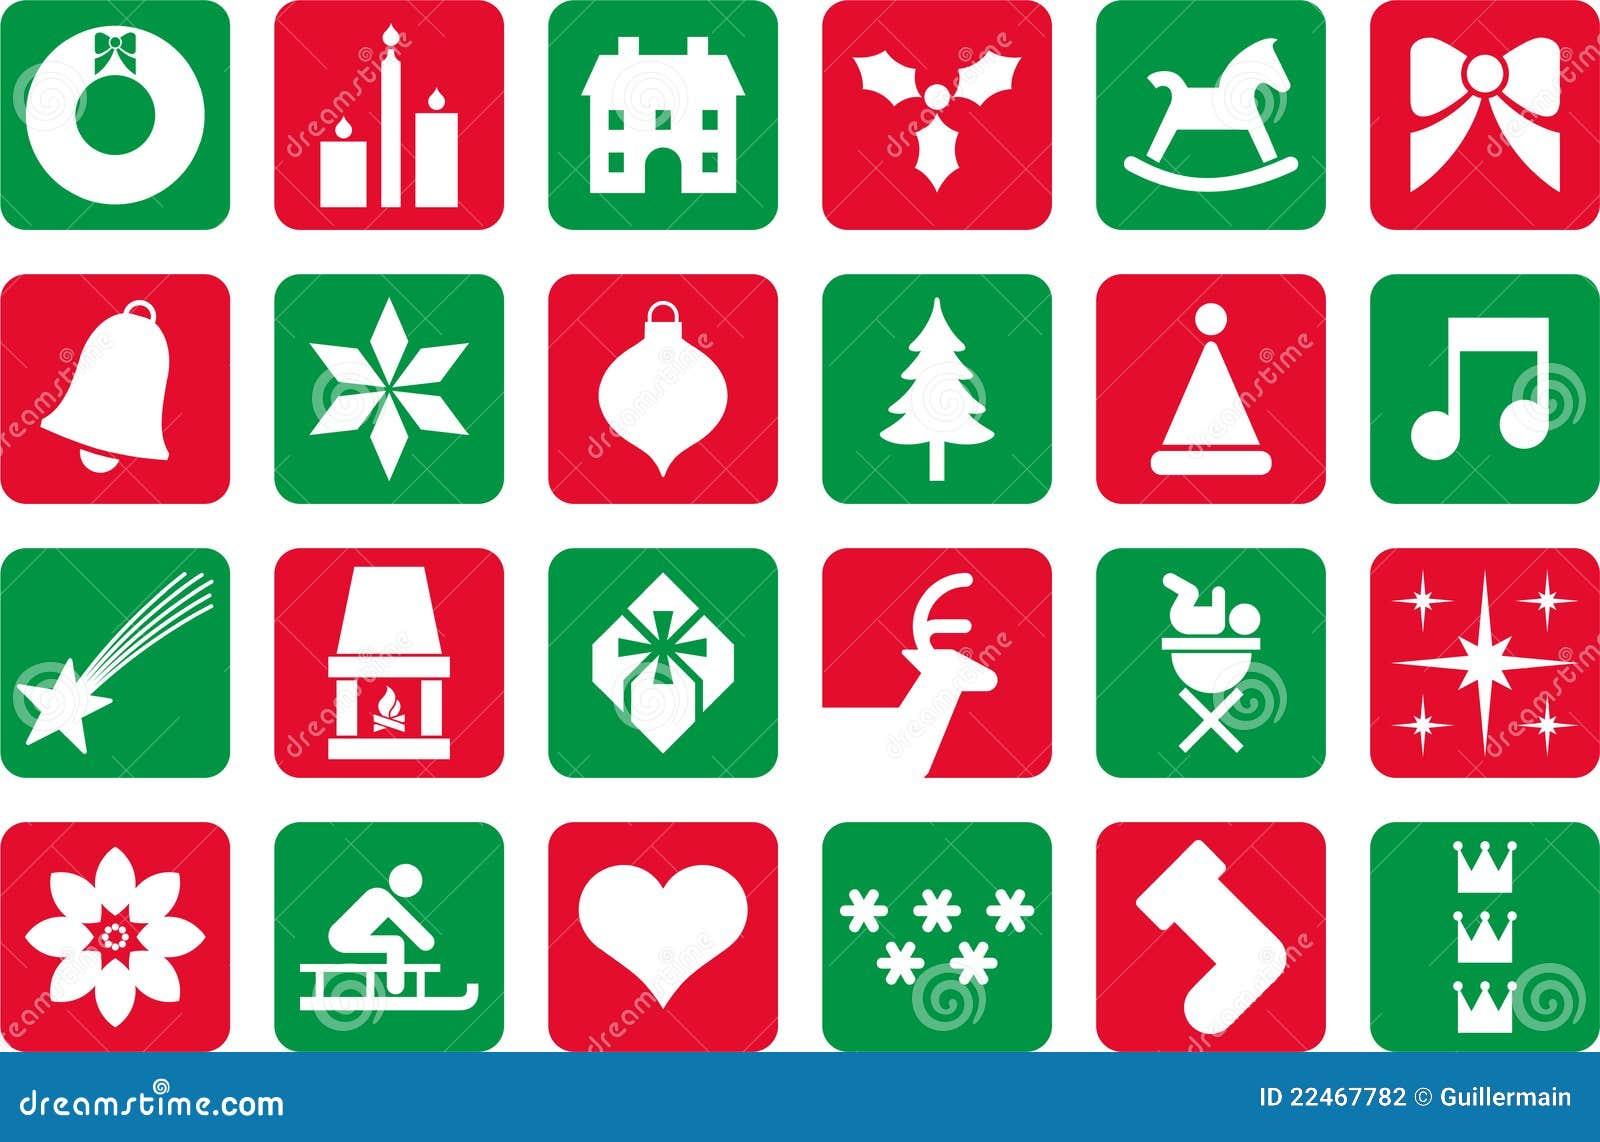 Christmas Pictograms Stock Photography Image 22467782